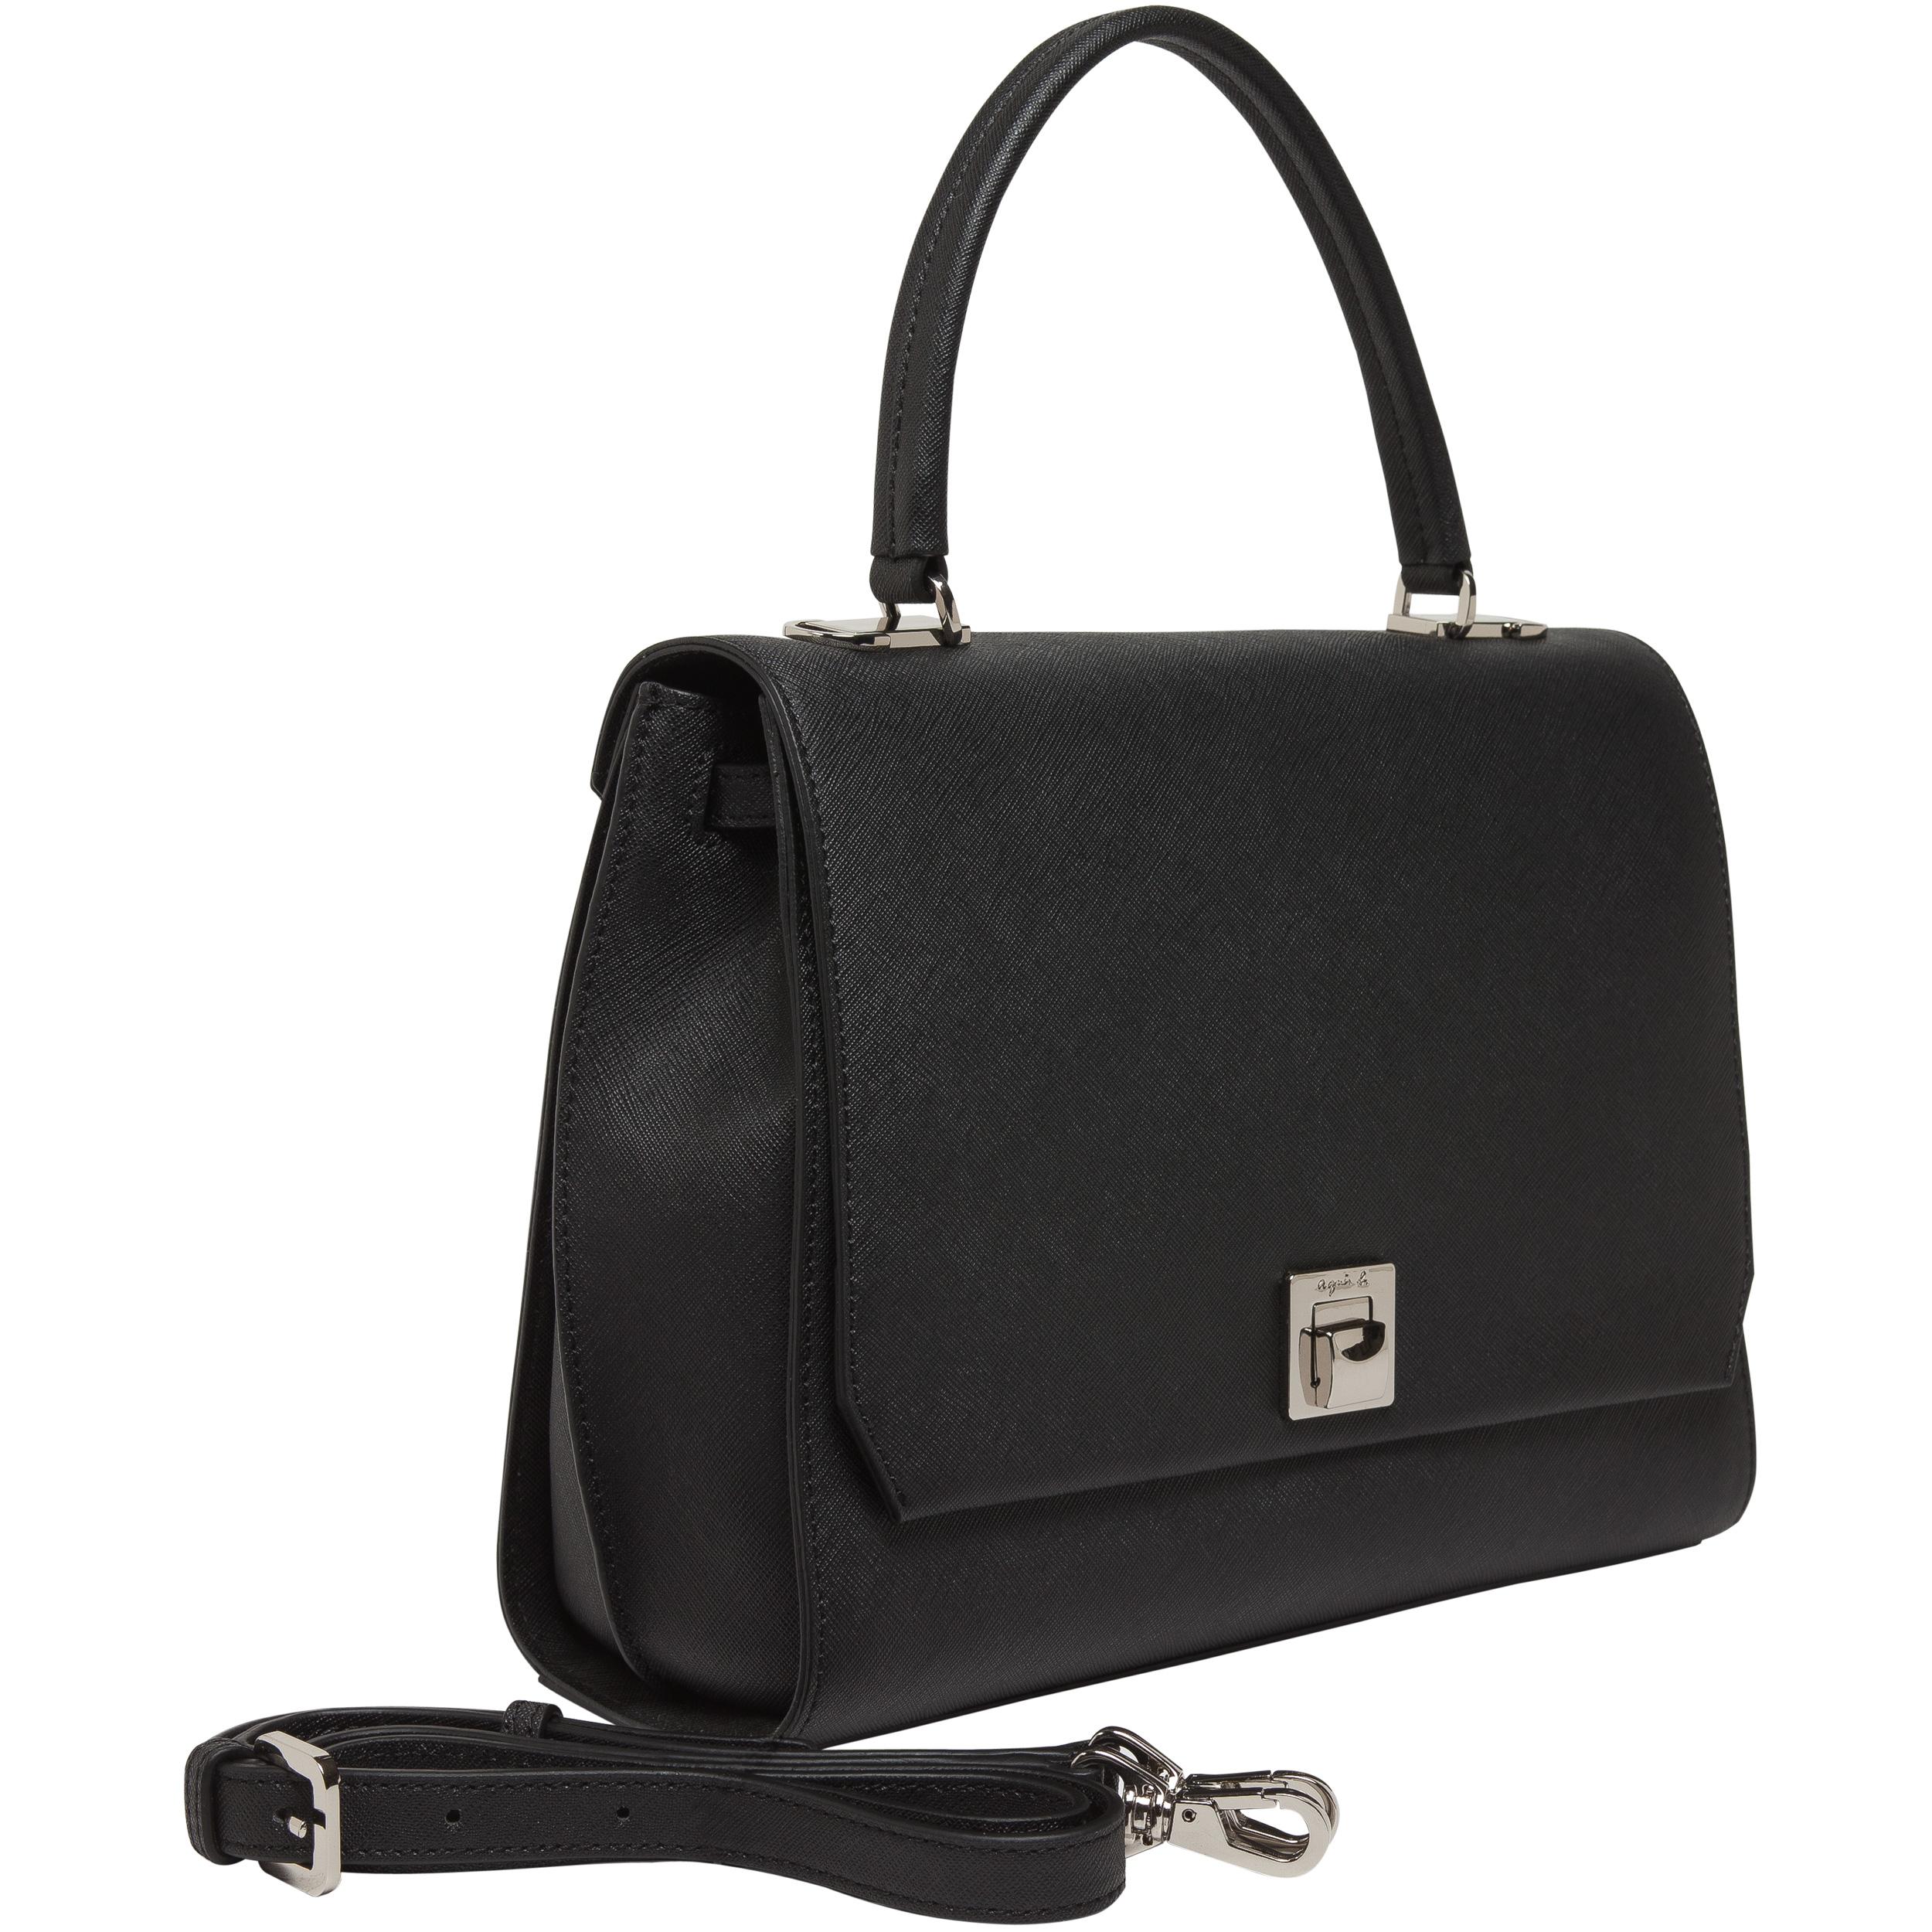 Gucci Dionysus Small Embroidered Shoulder Bag, Black/Multi Details Gucci floral-embroidered leather shoulder bag from the